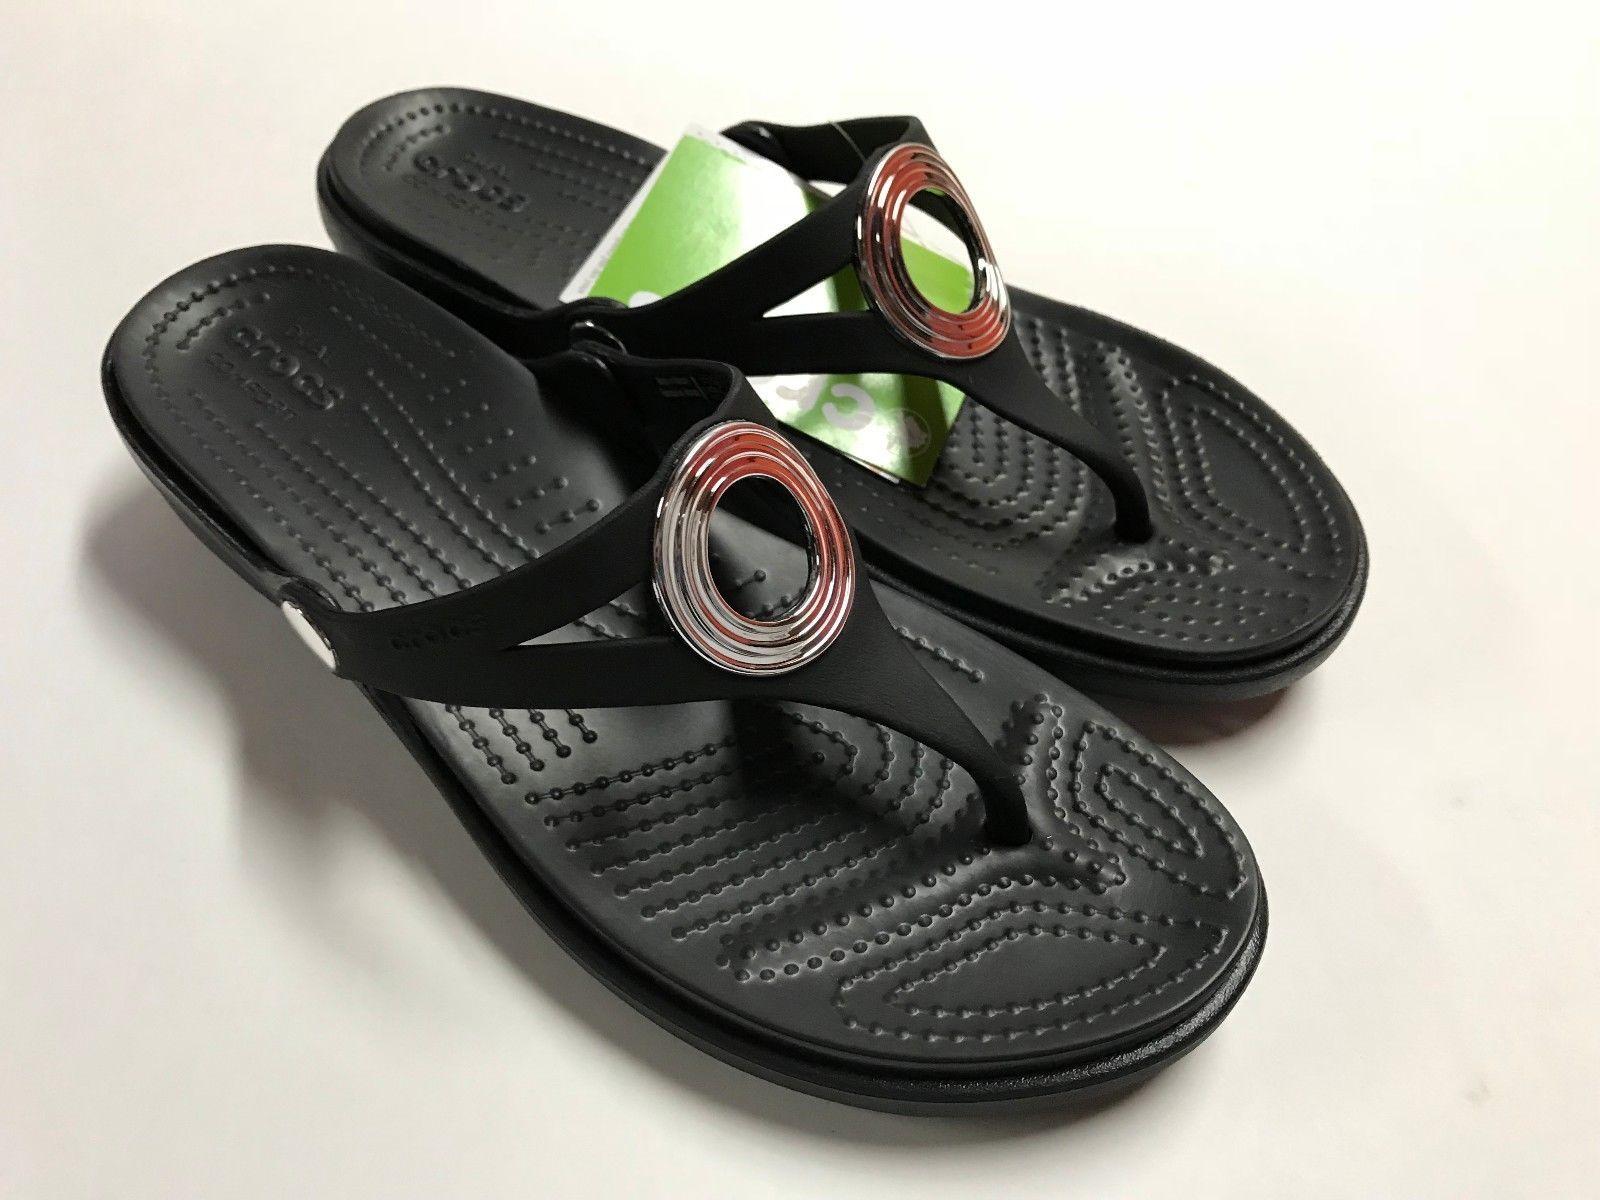 8136e8a0a971 S l1600. S l1600. Previous. NEW Crocs Womens Sanrah Beveled Circle Wedge  Flip Black Size-5 · NEW Crocs Womens ...